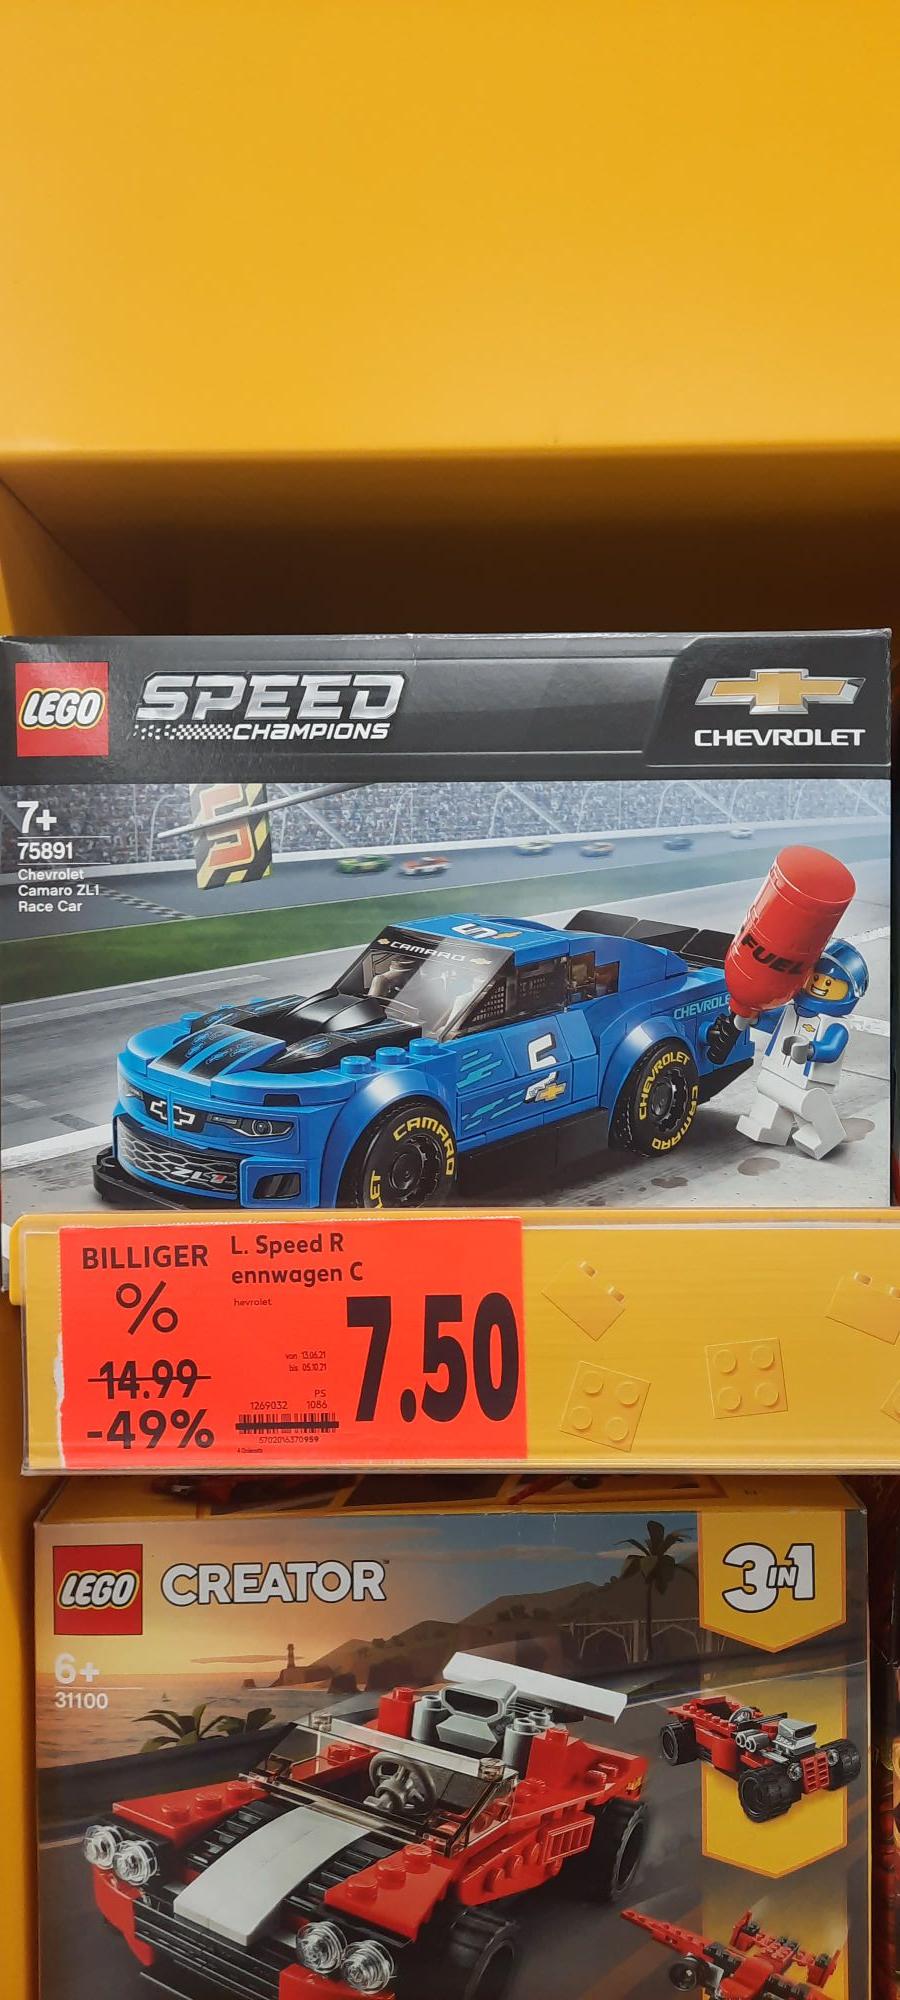 [LOKAL - Dallgow Döberitz] LEGO Speedchampions Chevrolet Camaro ZL1 (75891)